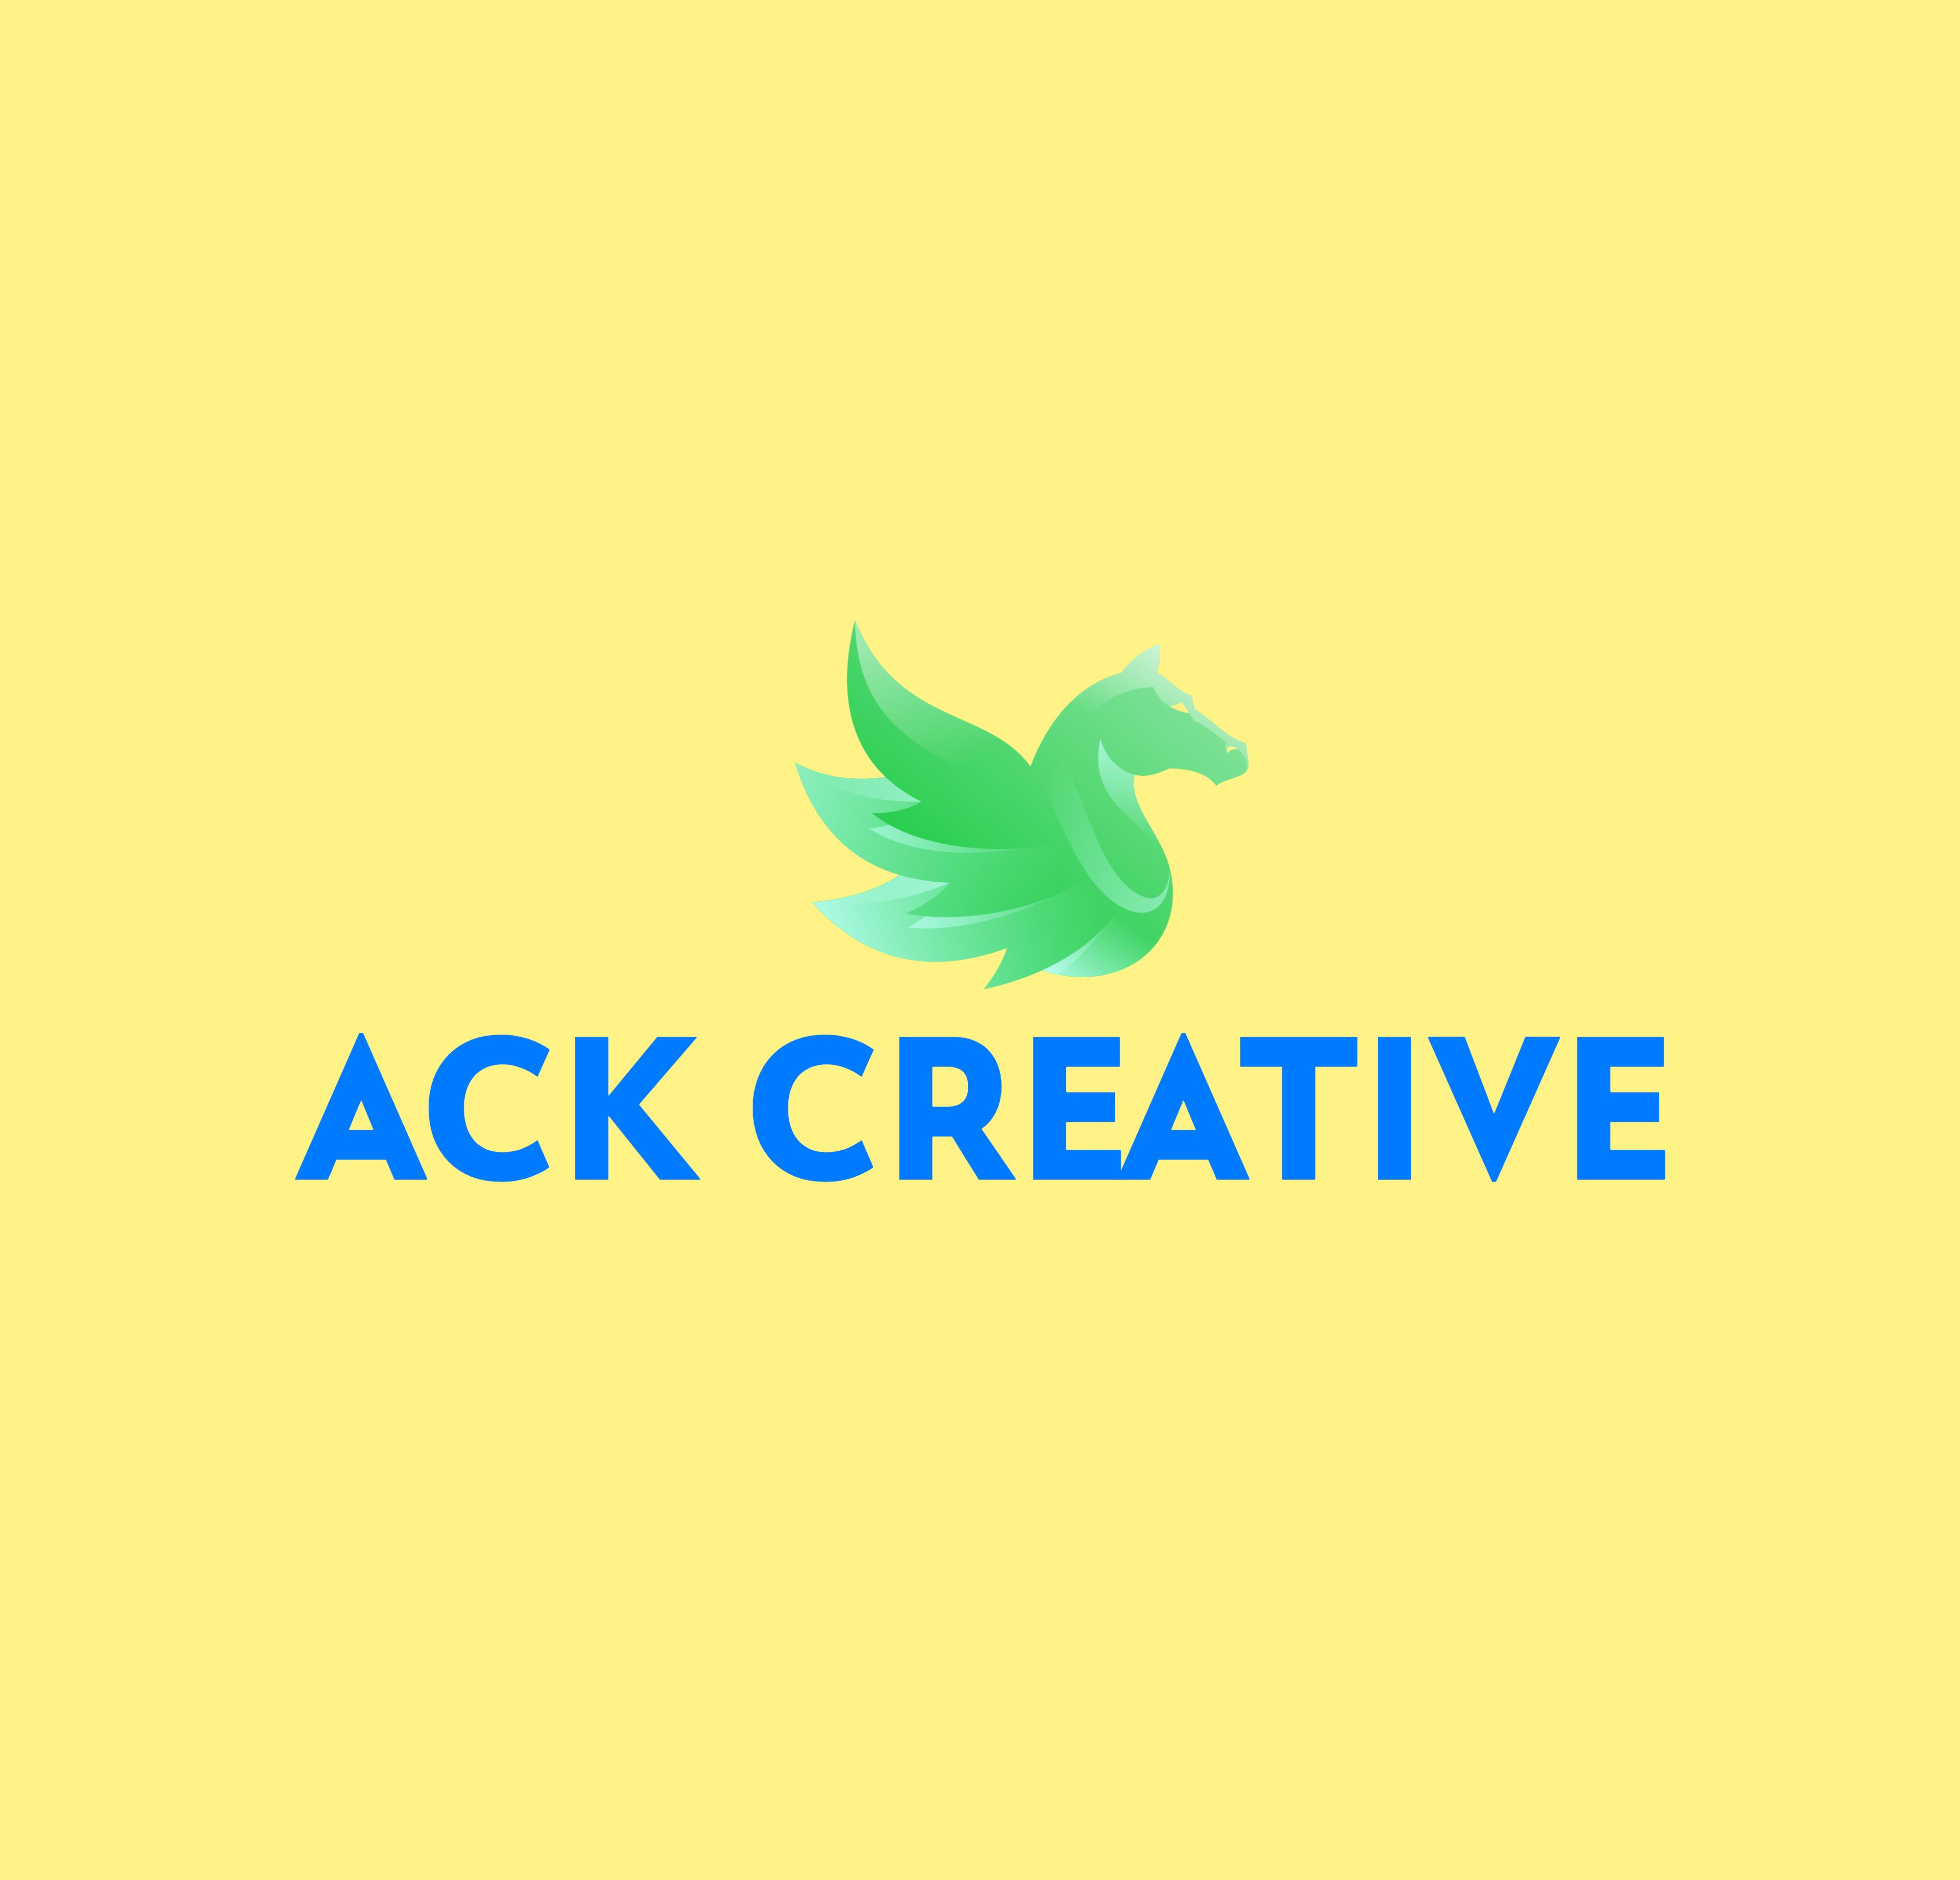 ACK CREATIVE